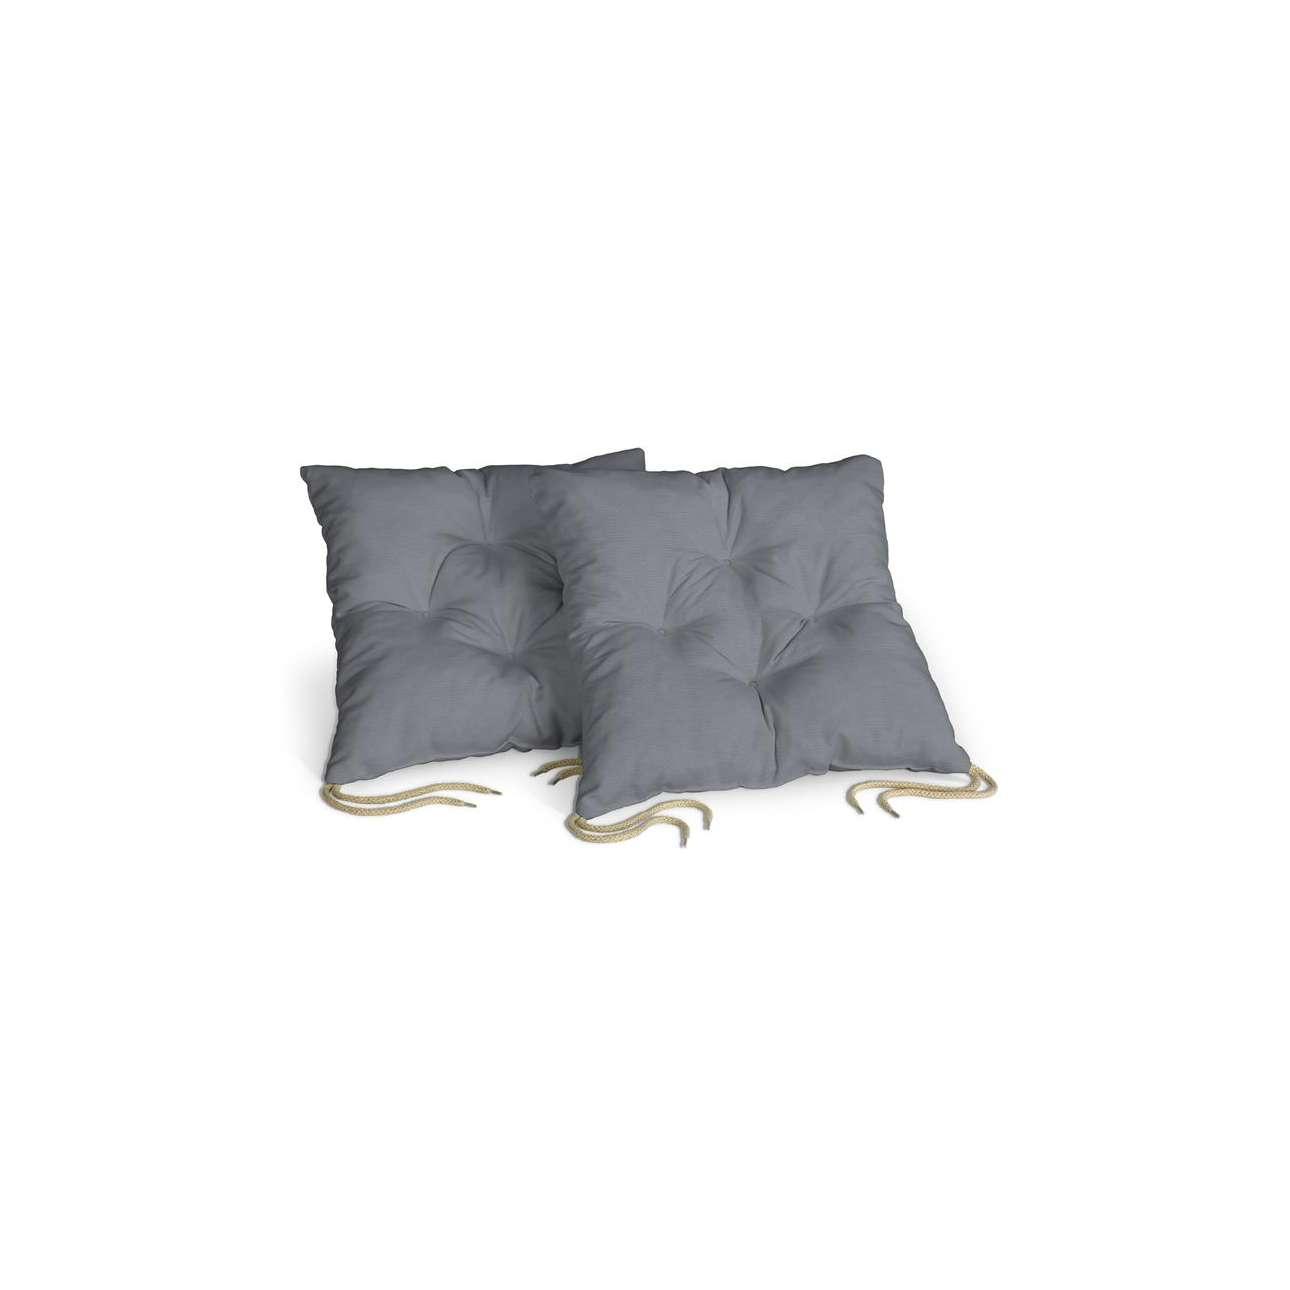 Sedáky 2-pack Cotton Panama 06 (702-07)